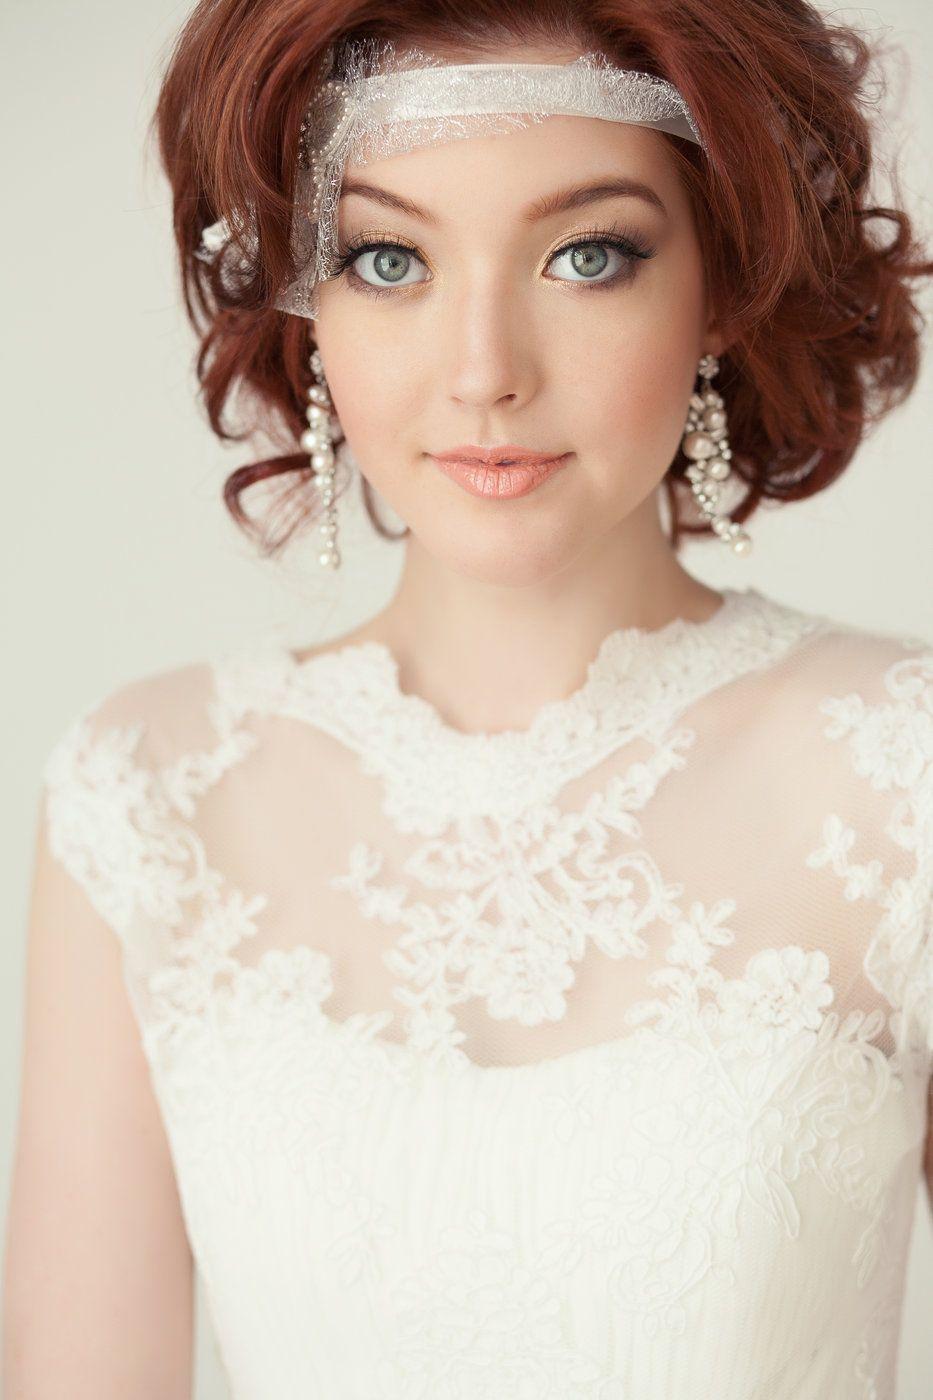 SHARON Y PARK - Hair and Makeup bridal makeup golden eyes blushing ...